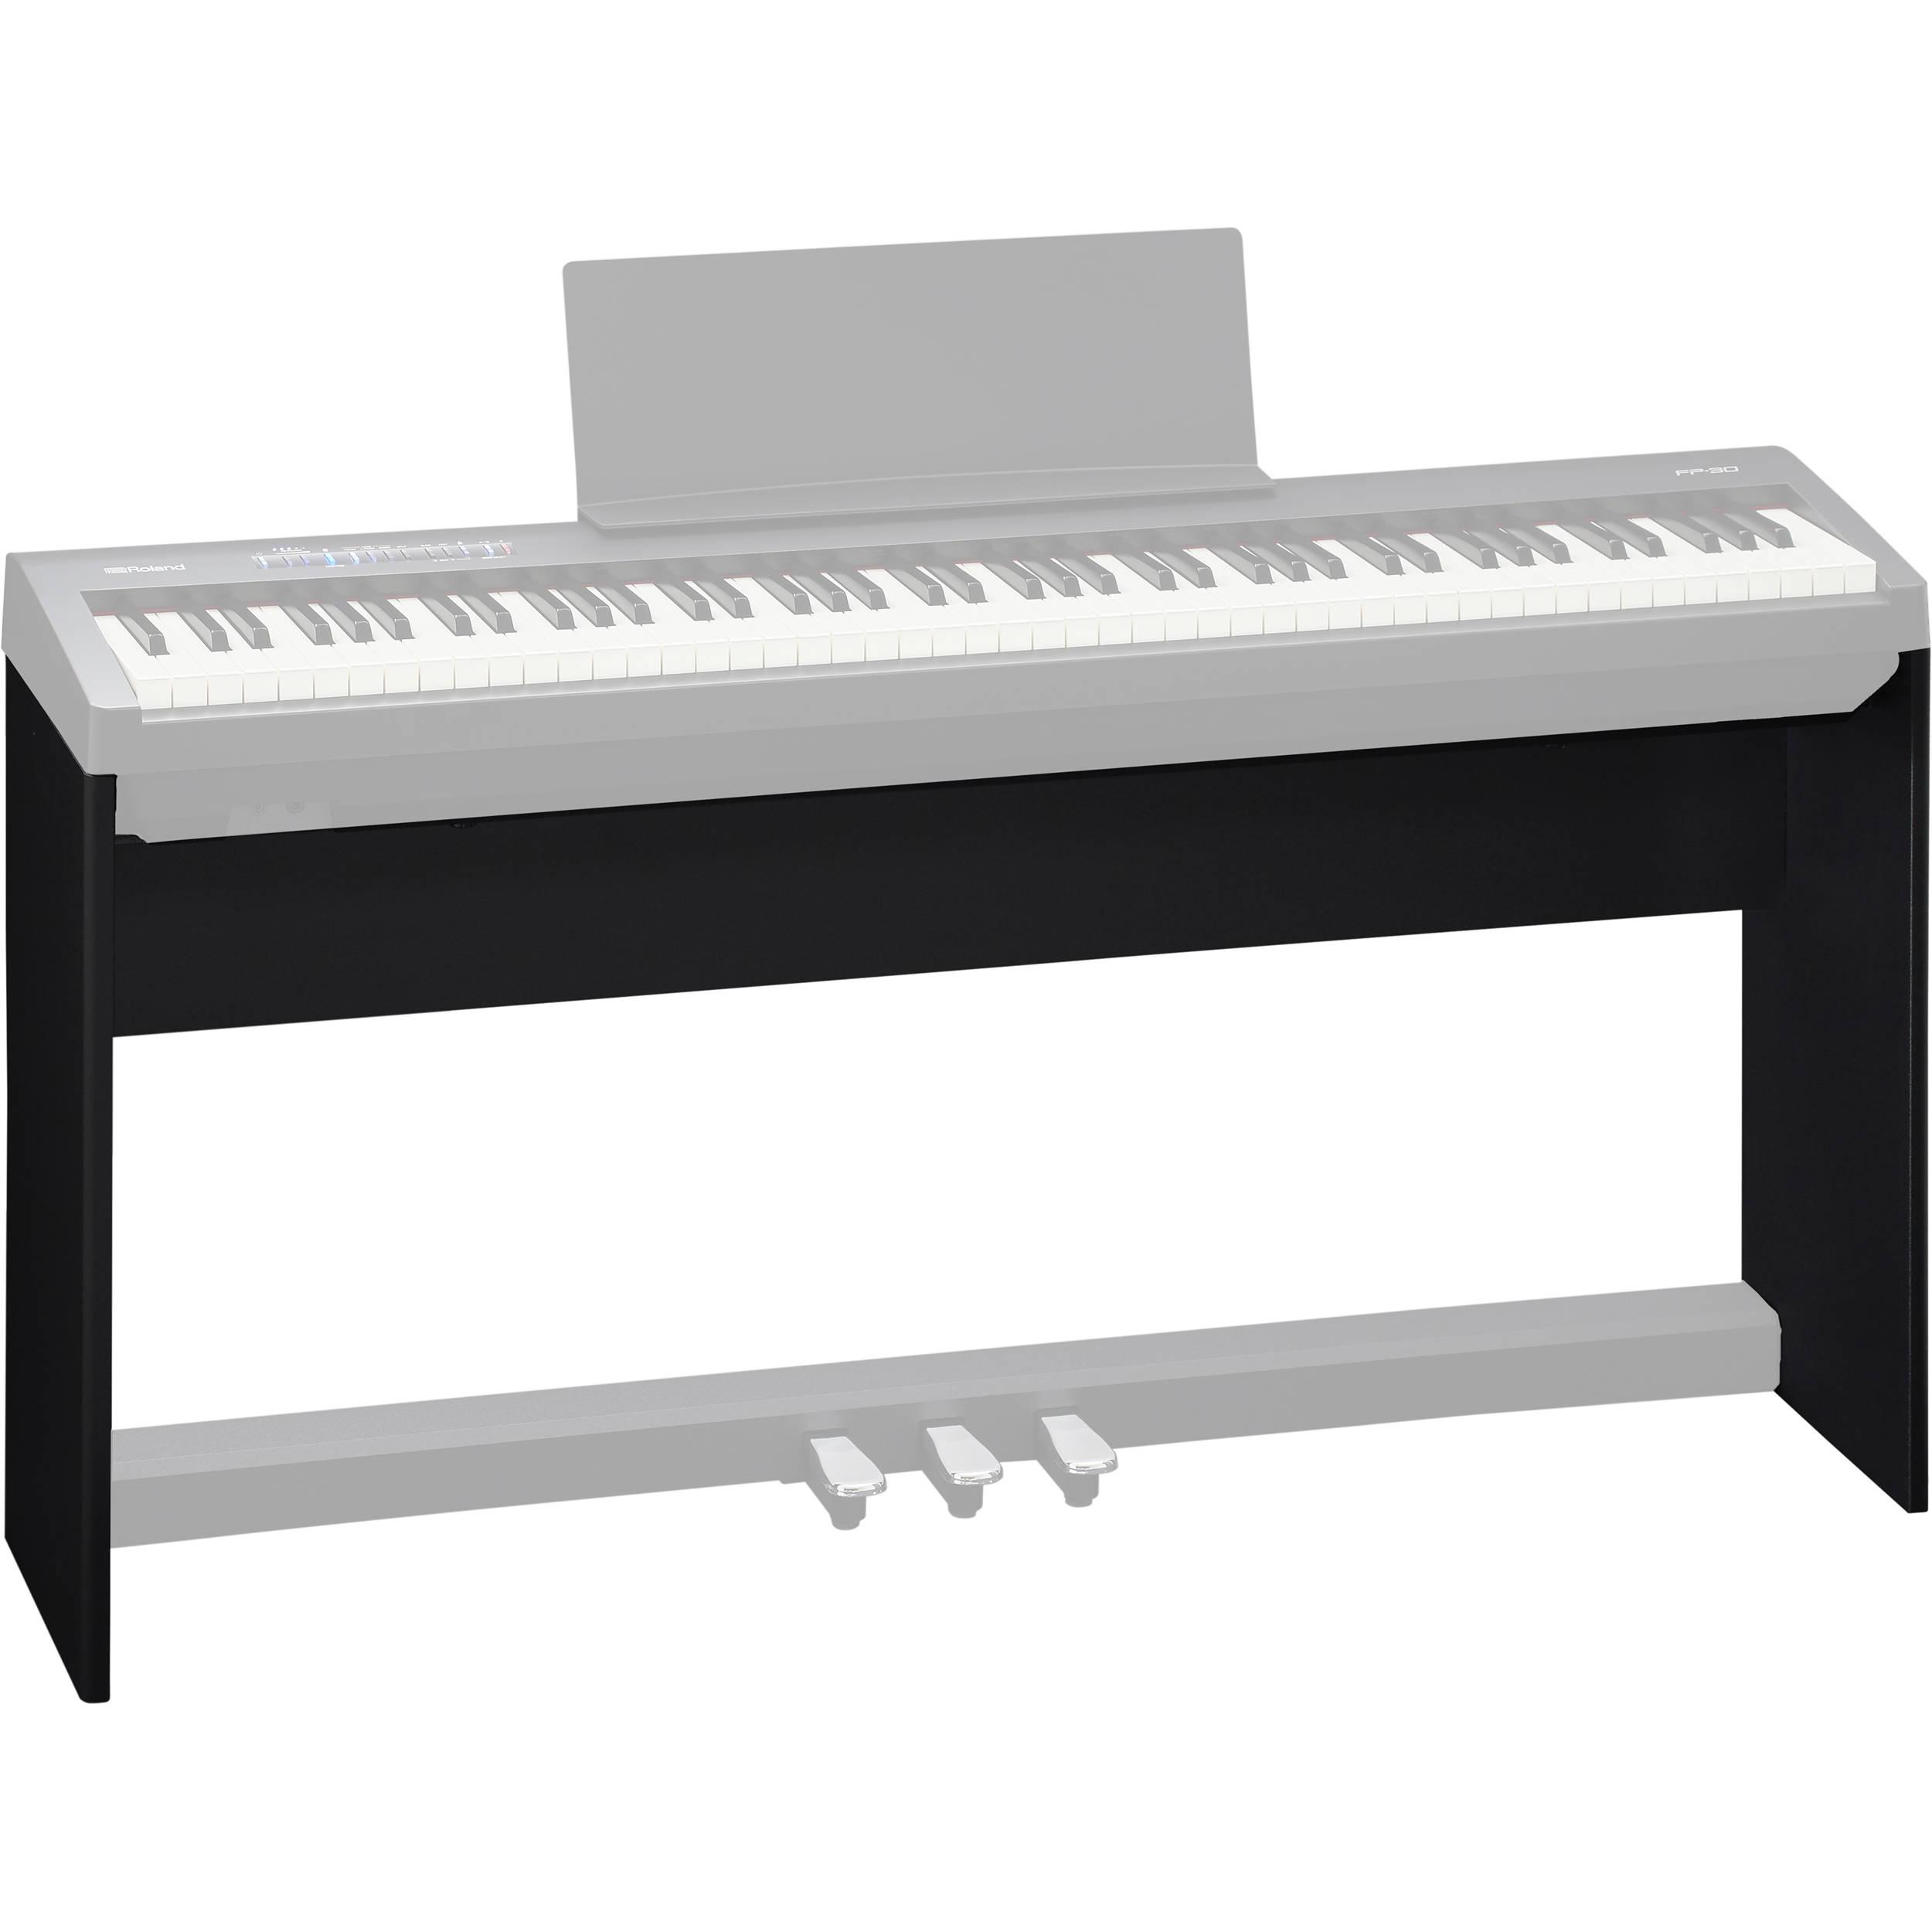 Roland Ksc 70 Stand For Fp 30 Digital Piano Black Ksc 70 Bk